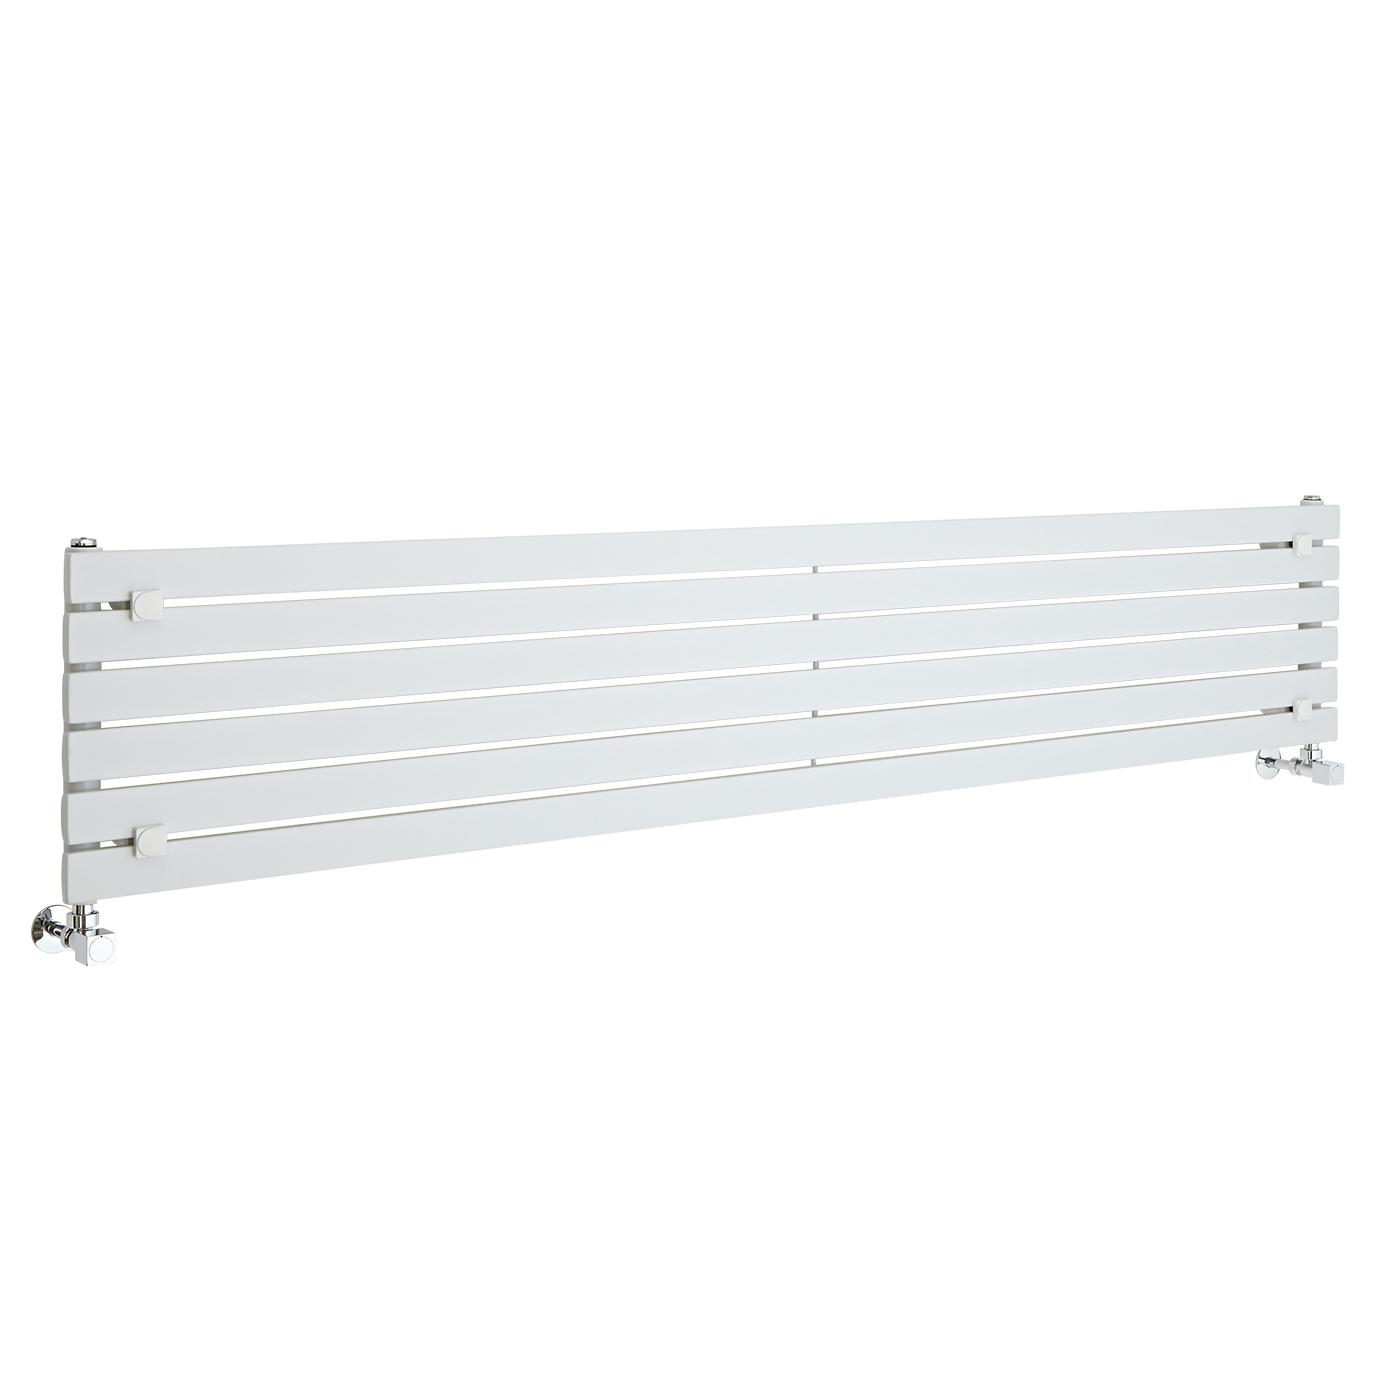 Radiador de Diseño Horizontal - Blanco - 354mm x 1780mm x 54mm - 820 Vatios - Sloane